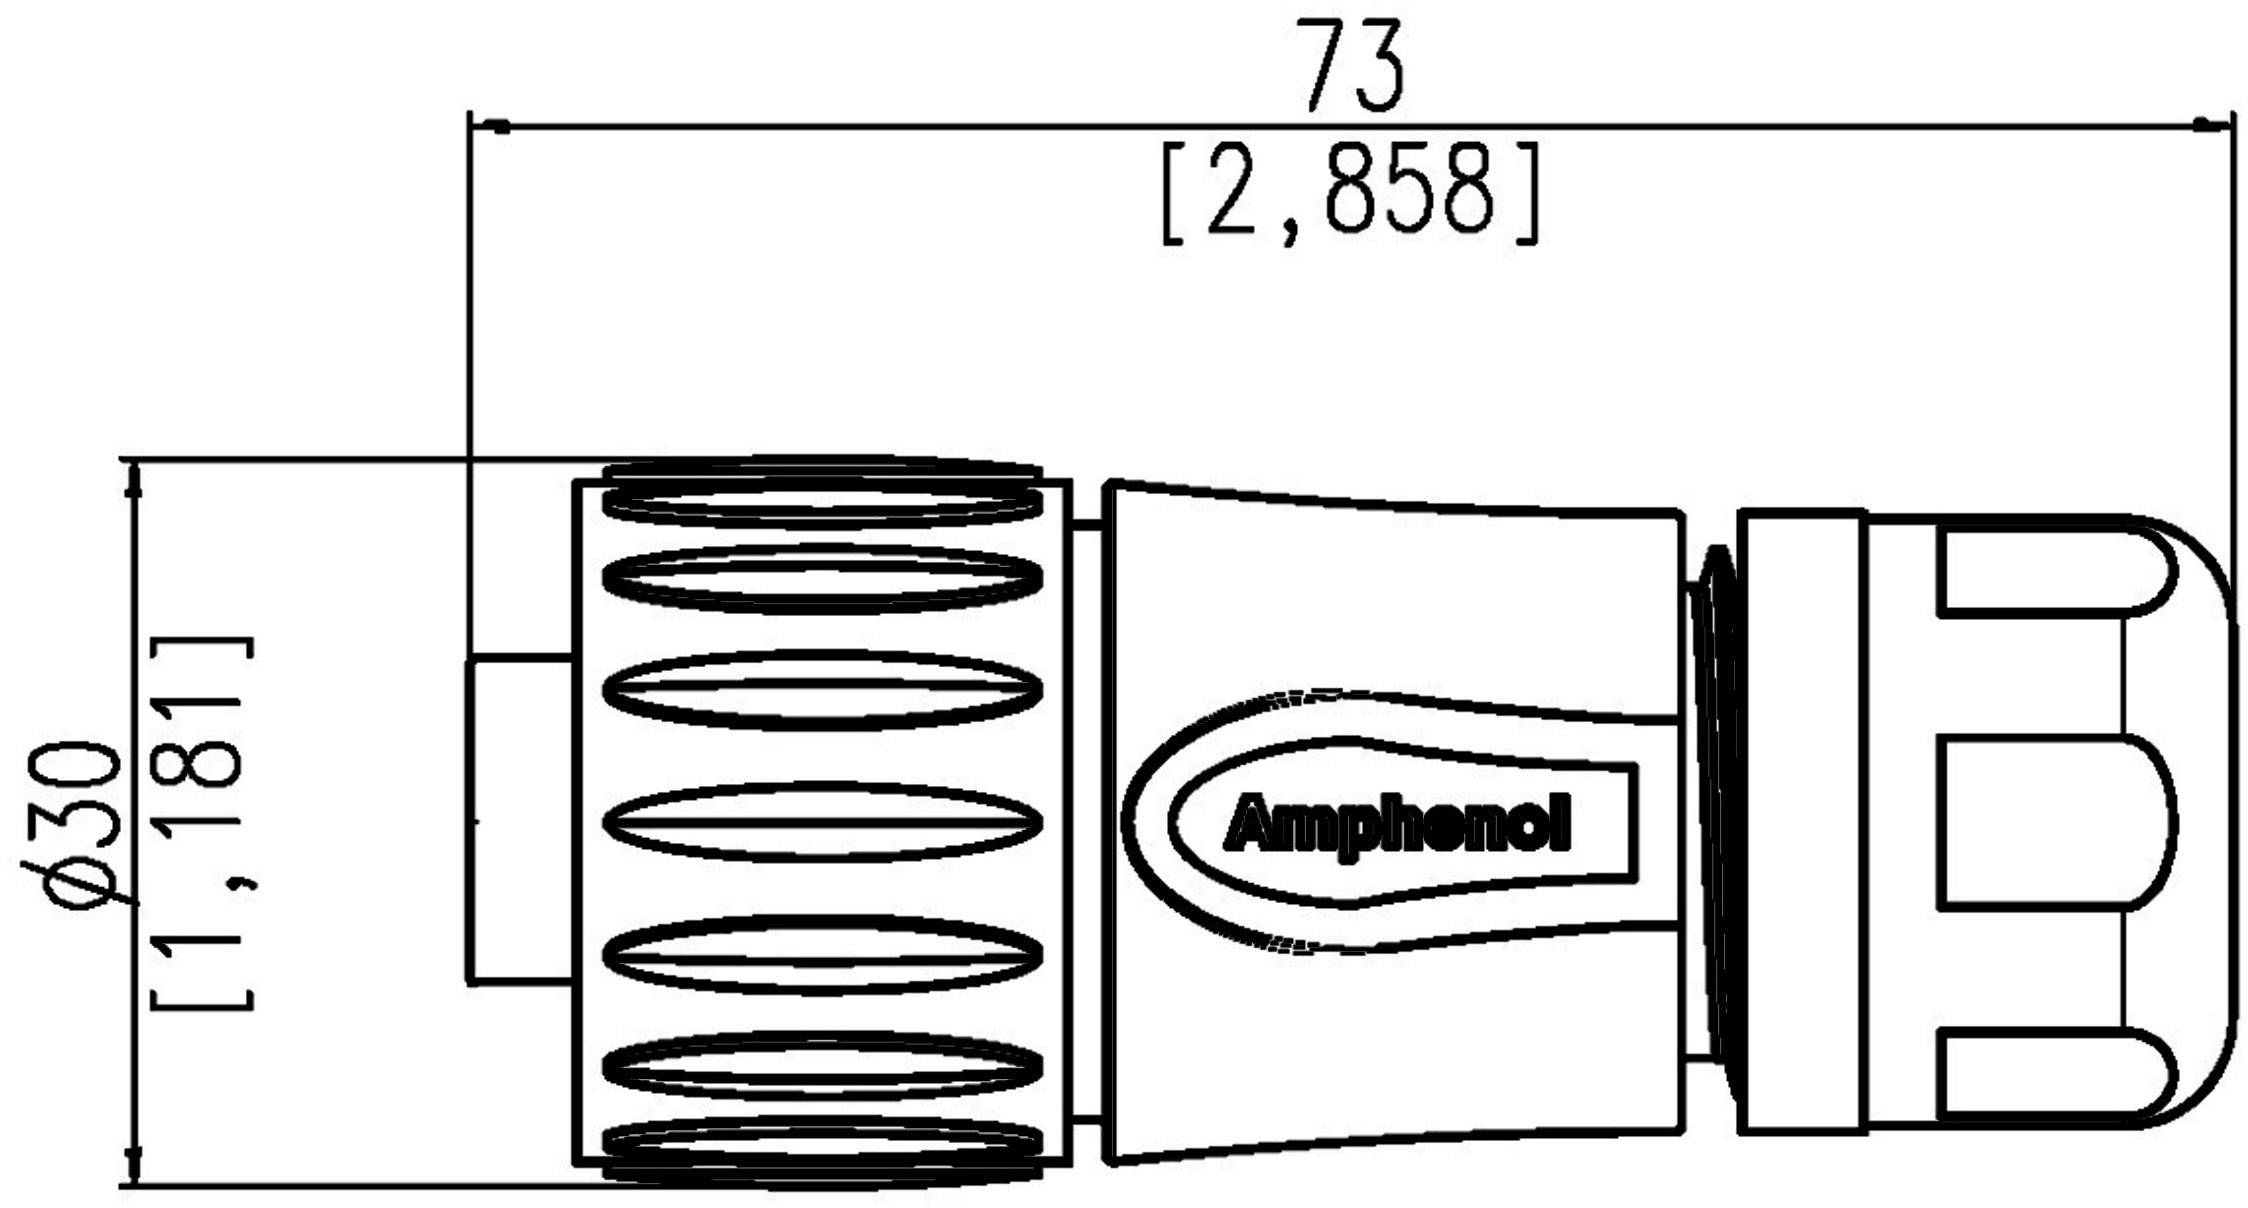 Guľatý faston Amphenol C016 30H006 110 12 IP67 (v zablokovanom stave), polyamid 6.6, pólů 6 + PE, 1 ks